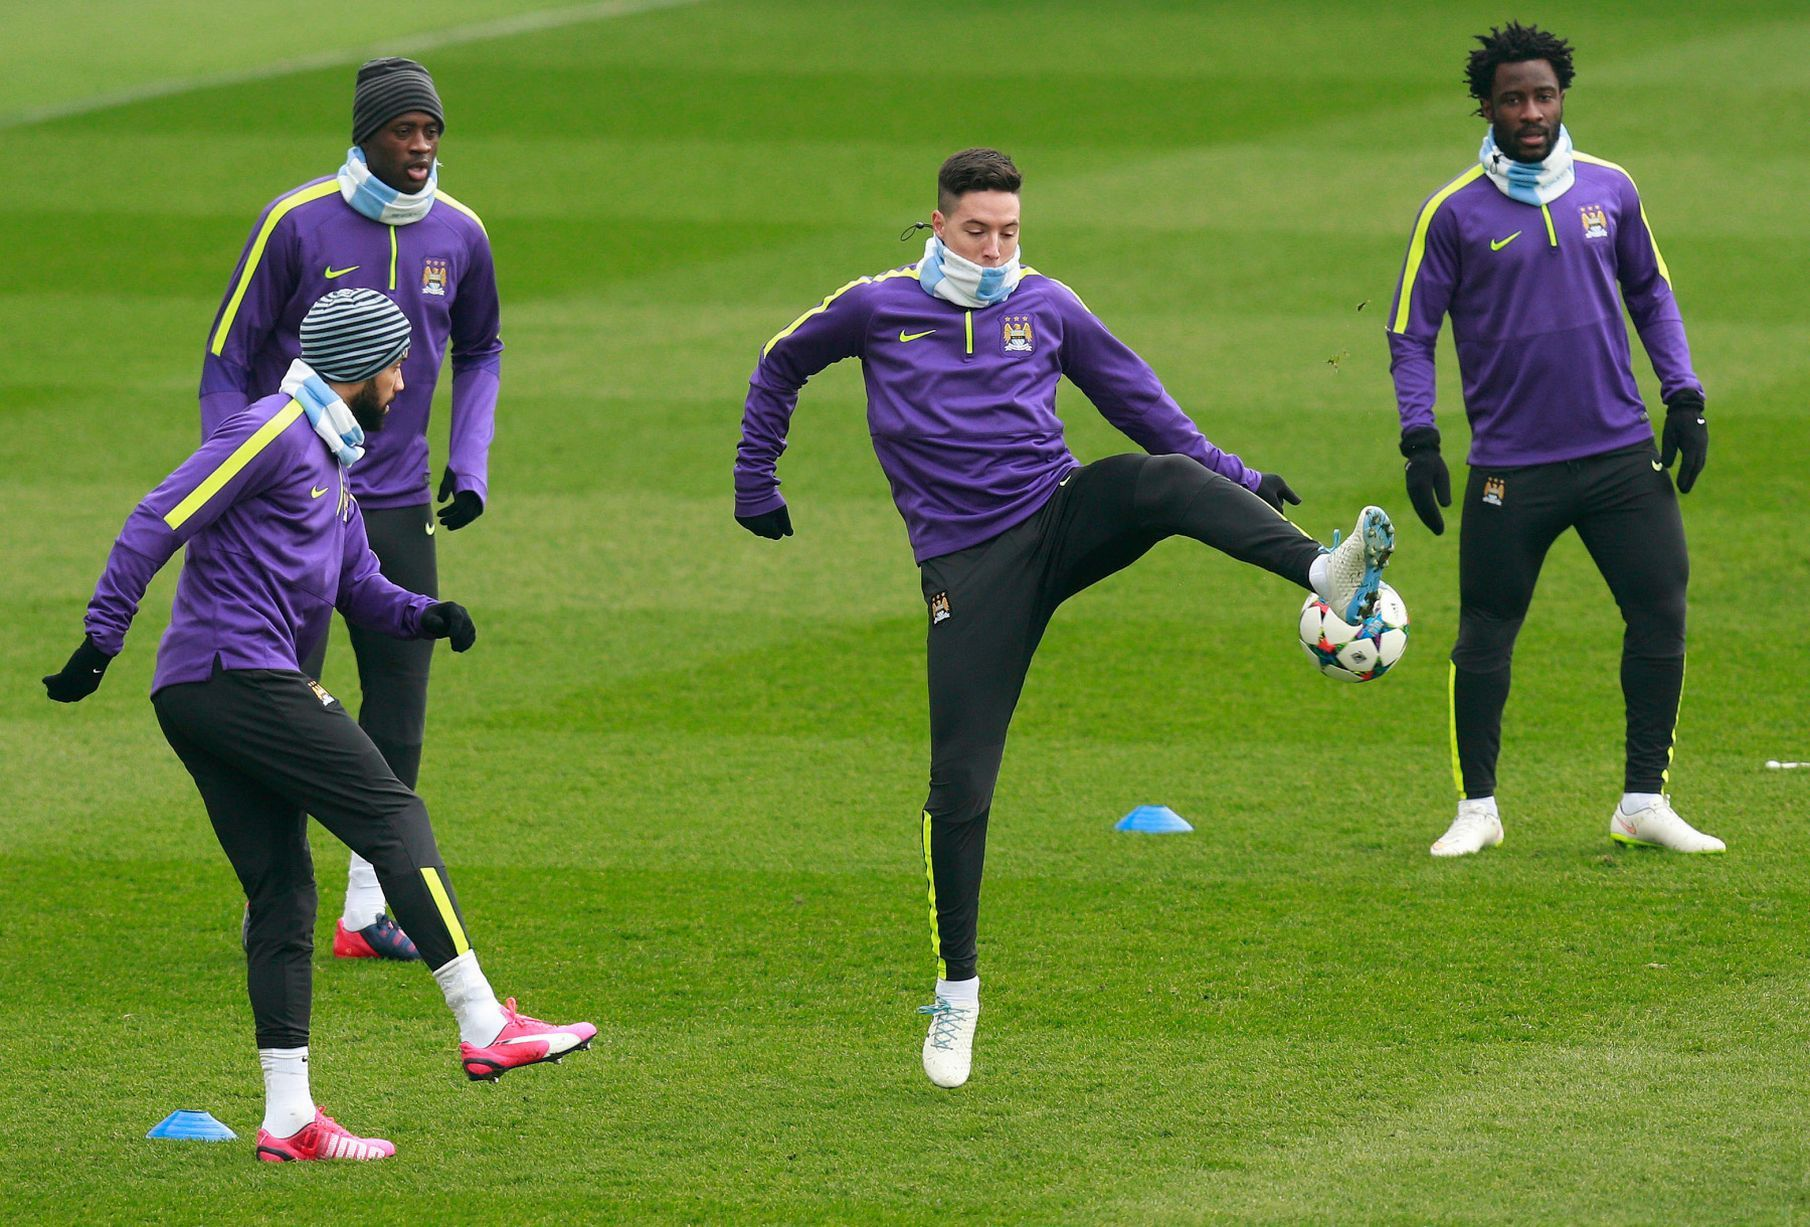 (De izquierda a derecha) del Manchester City Gael Clichy, Yaya Toure, Samir Nasri y Wilfried Bony